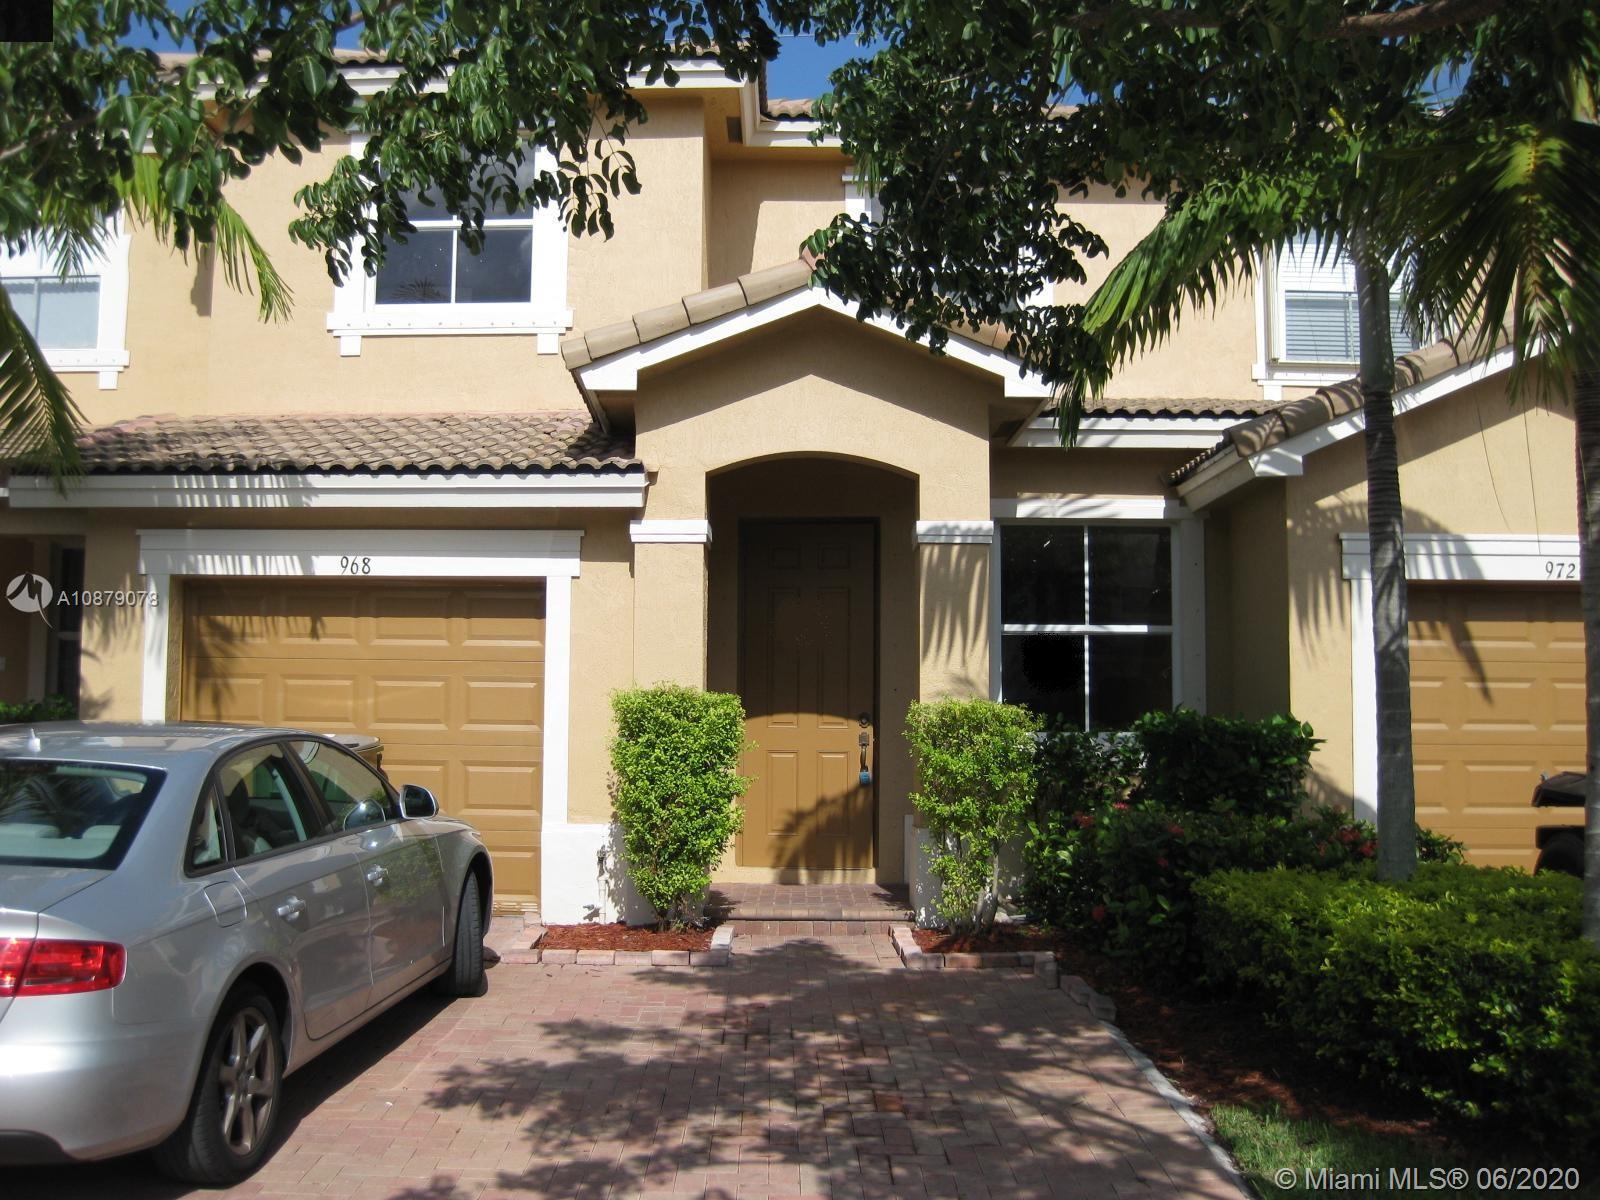 968 NE 41st PL Property Photo - Homestead, FL real estate listing